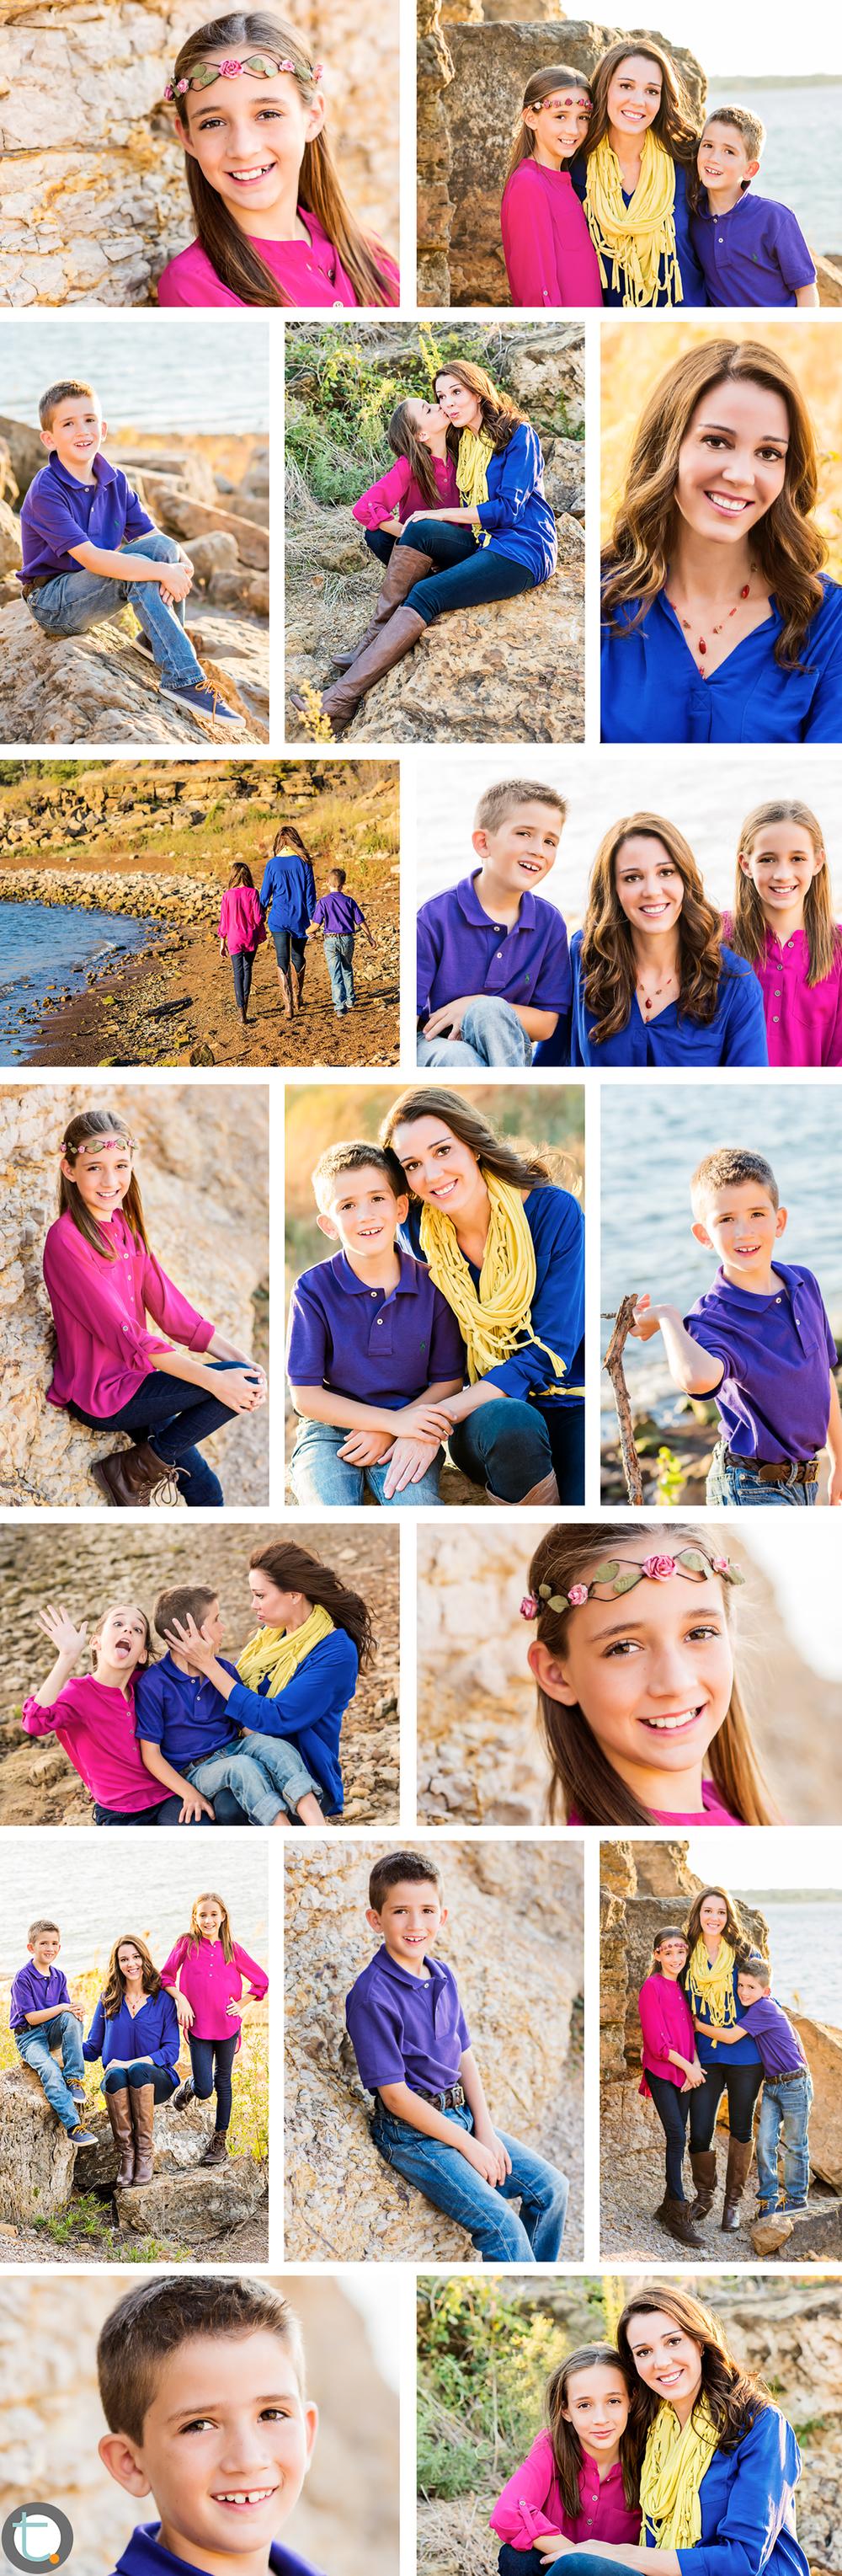 audra_kids_familyofthree_grapevinelake_dfwphotographer_2014